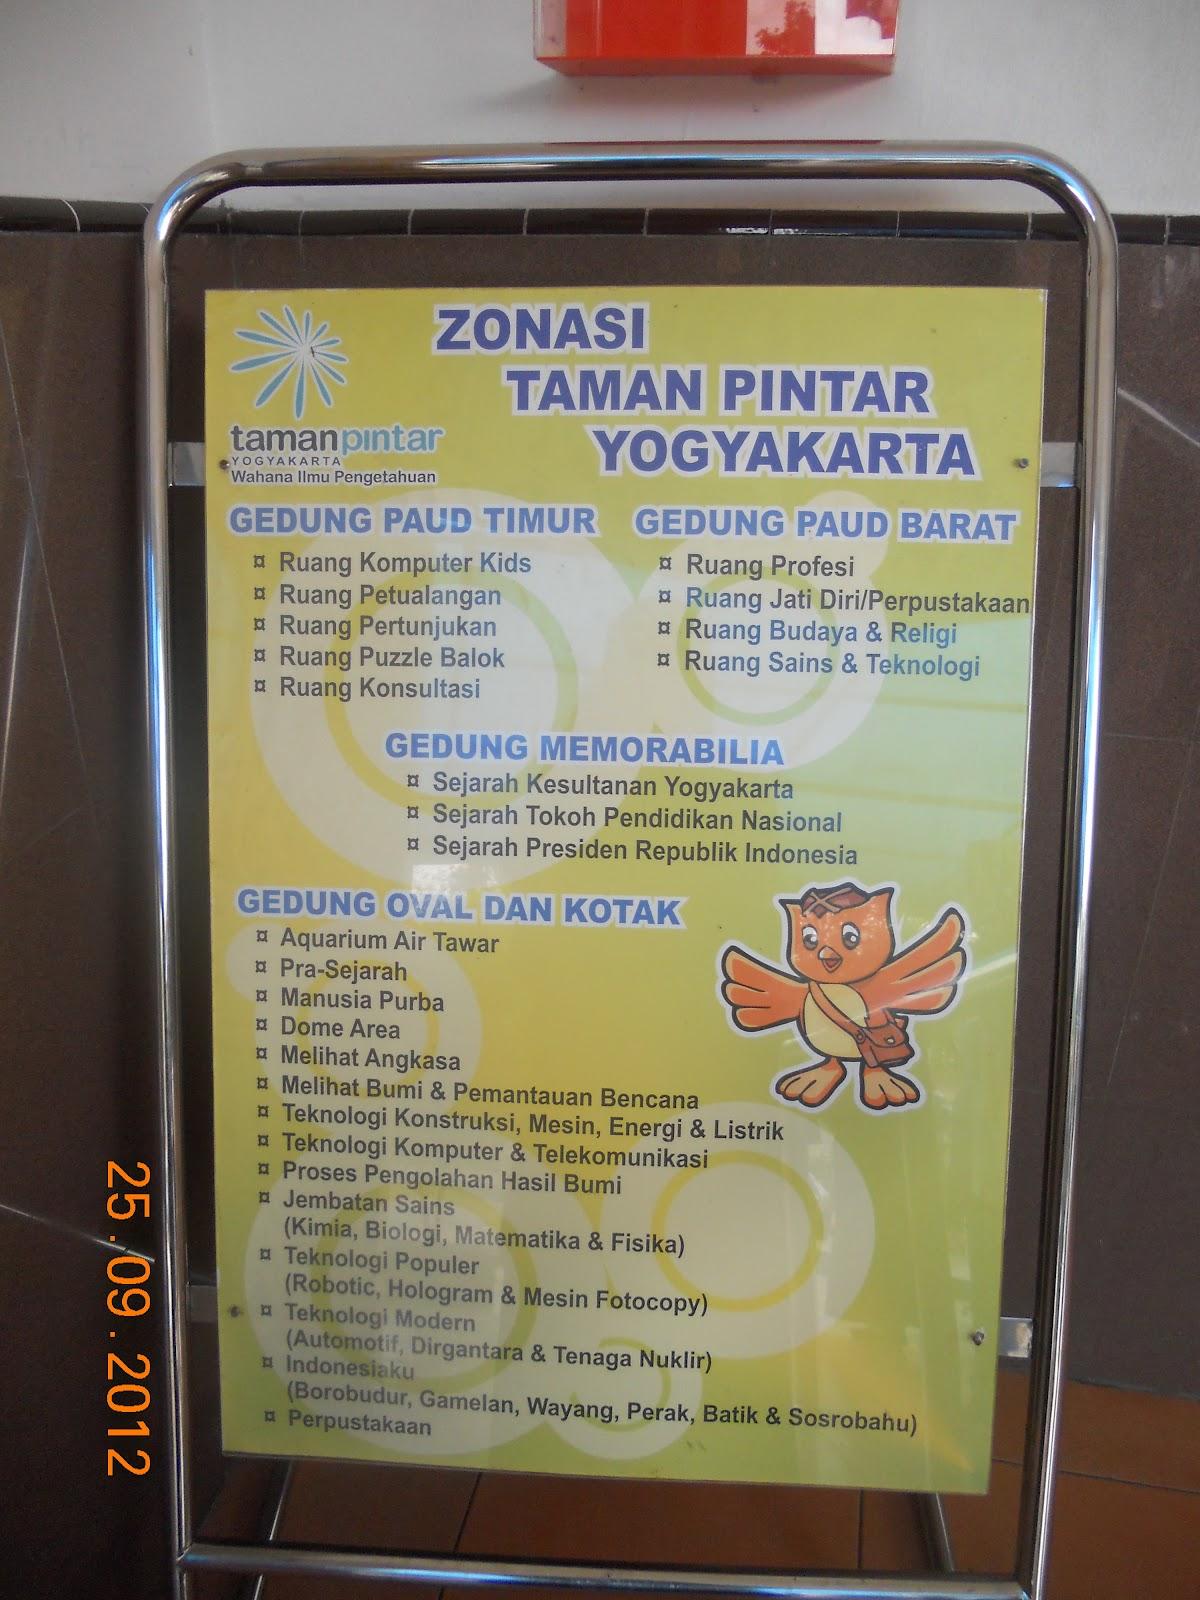 Taman Pintar Yogyakarta Moving Nah Daftar Zona Dibagi Gedung Masuki